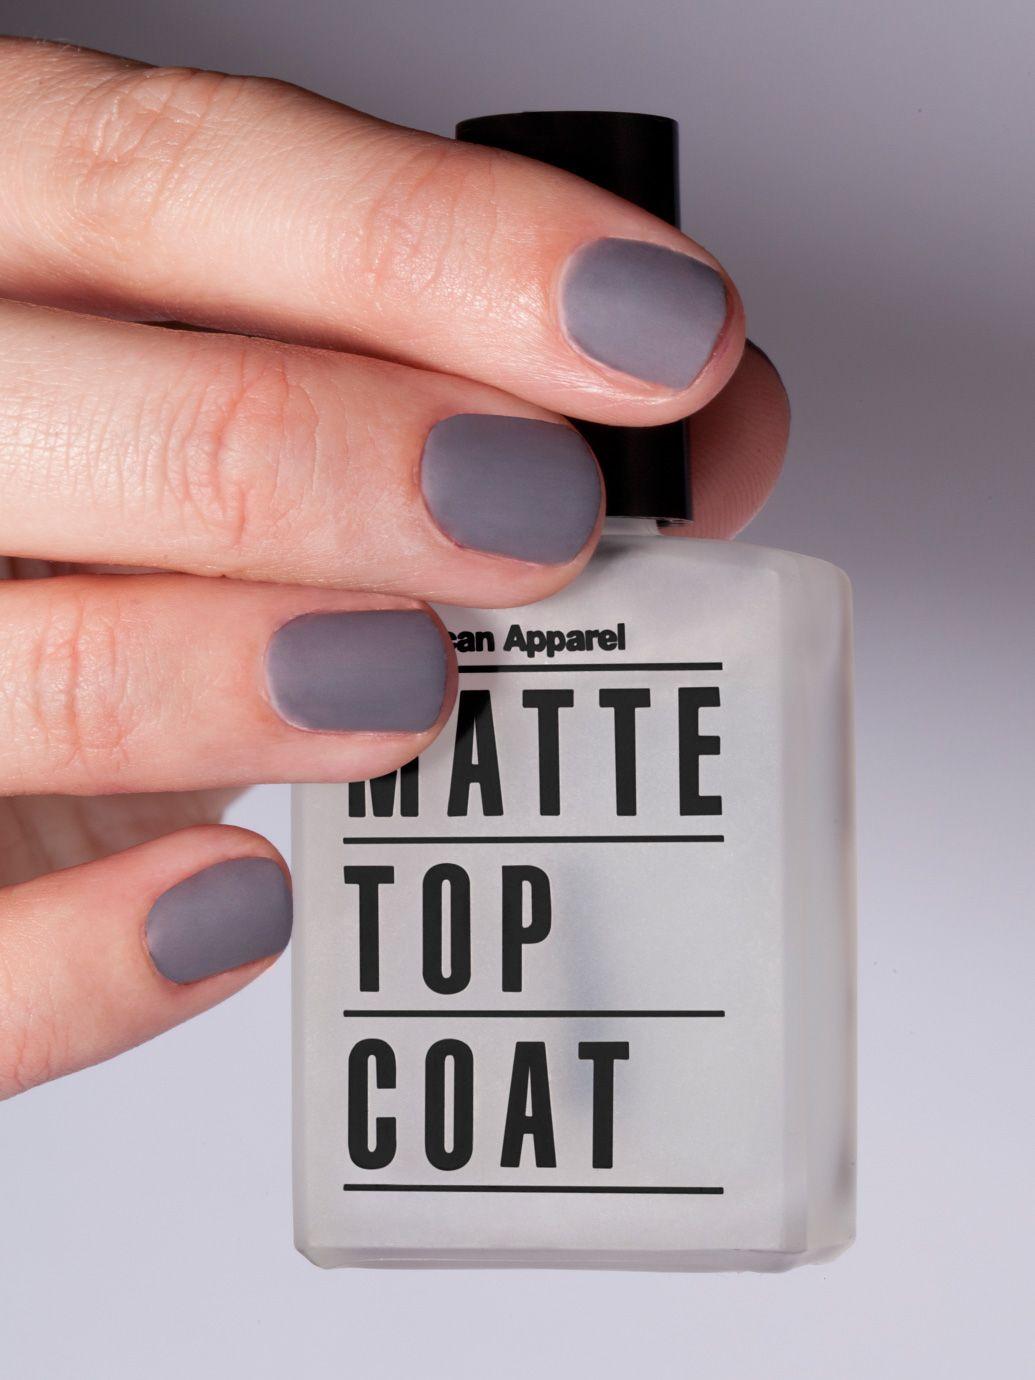 American Apparel - Matte Top Coat Nail Polish | wshlst | Pinterest ...